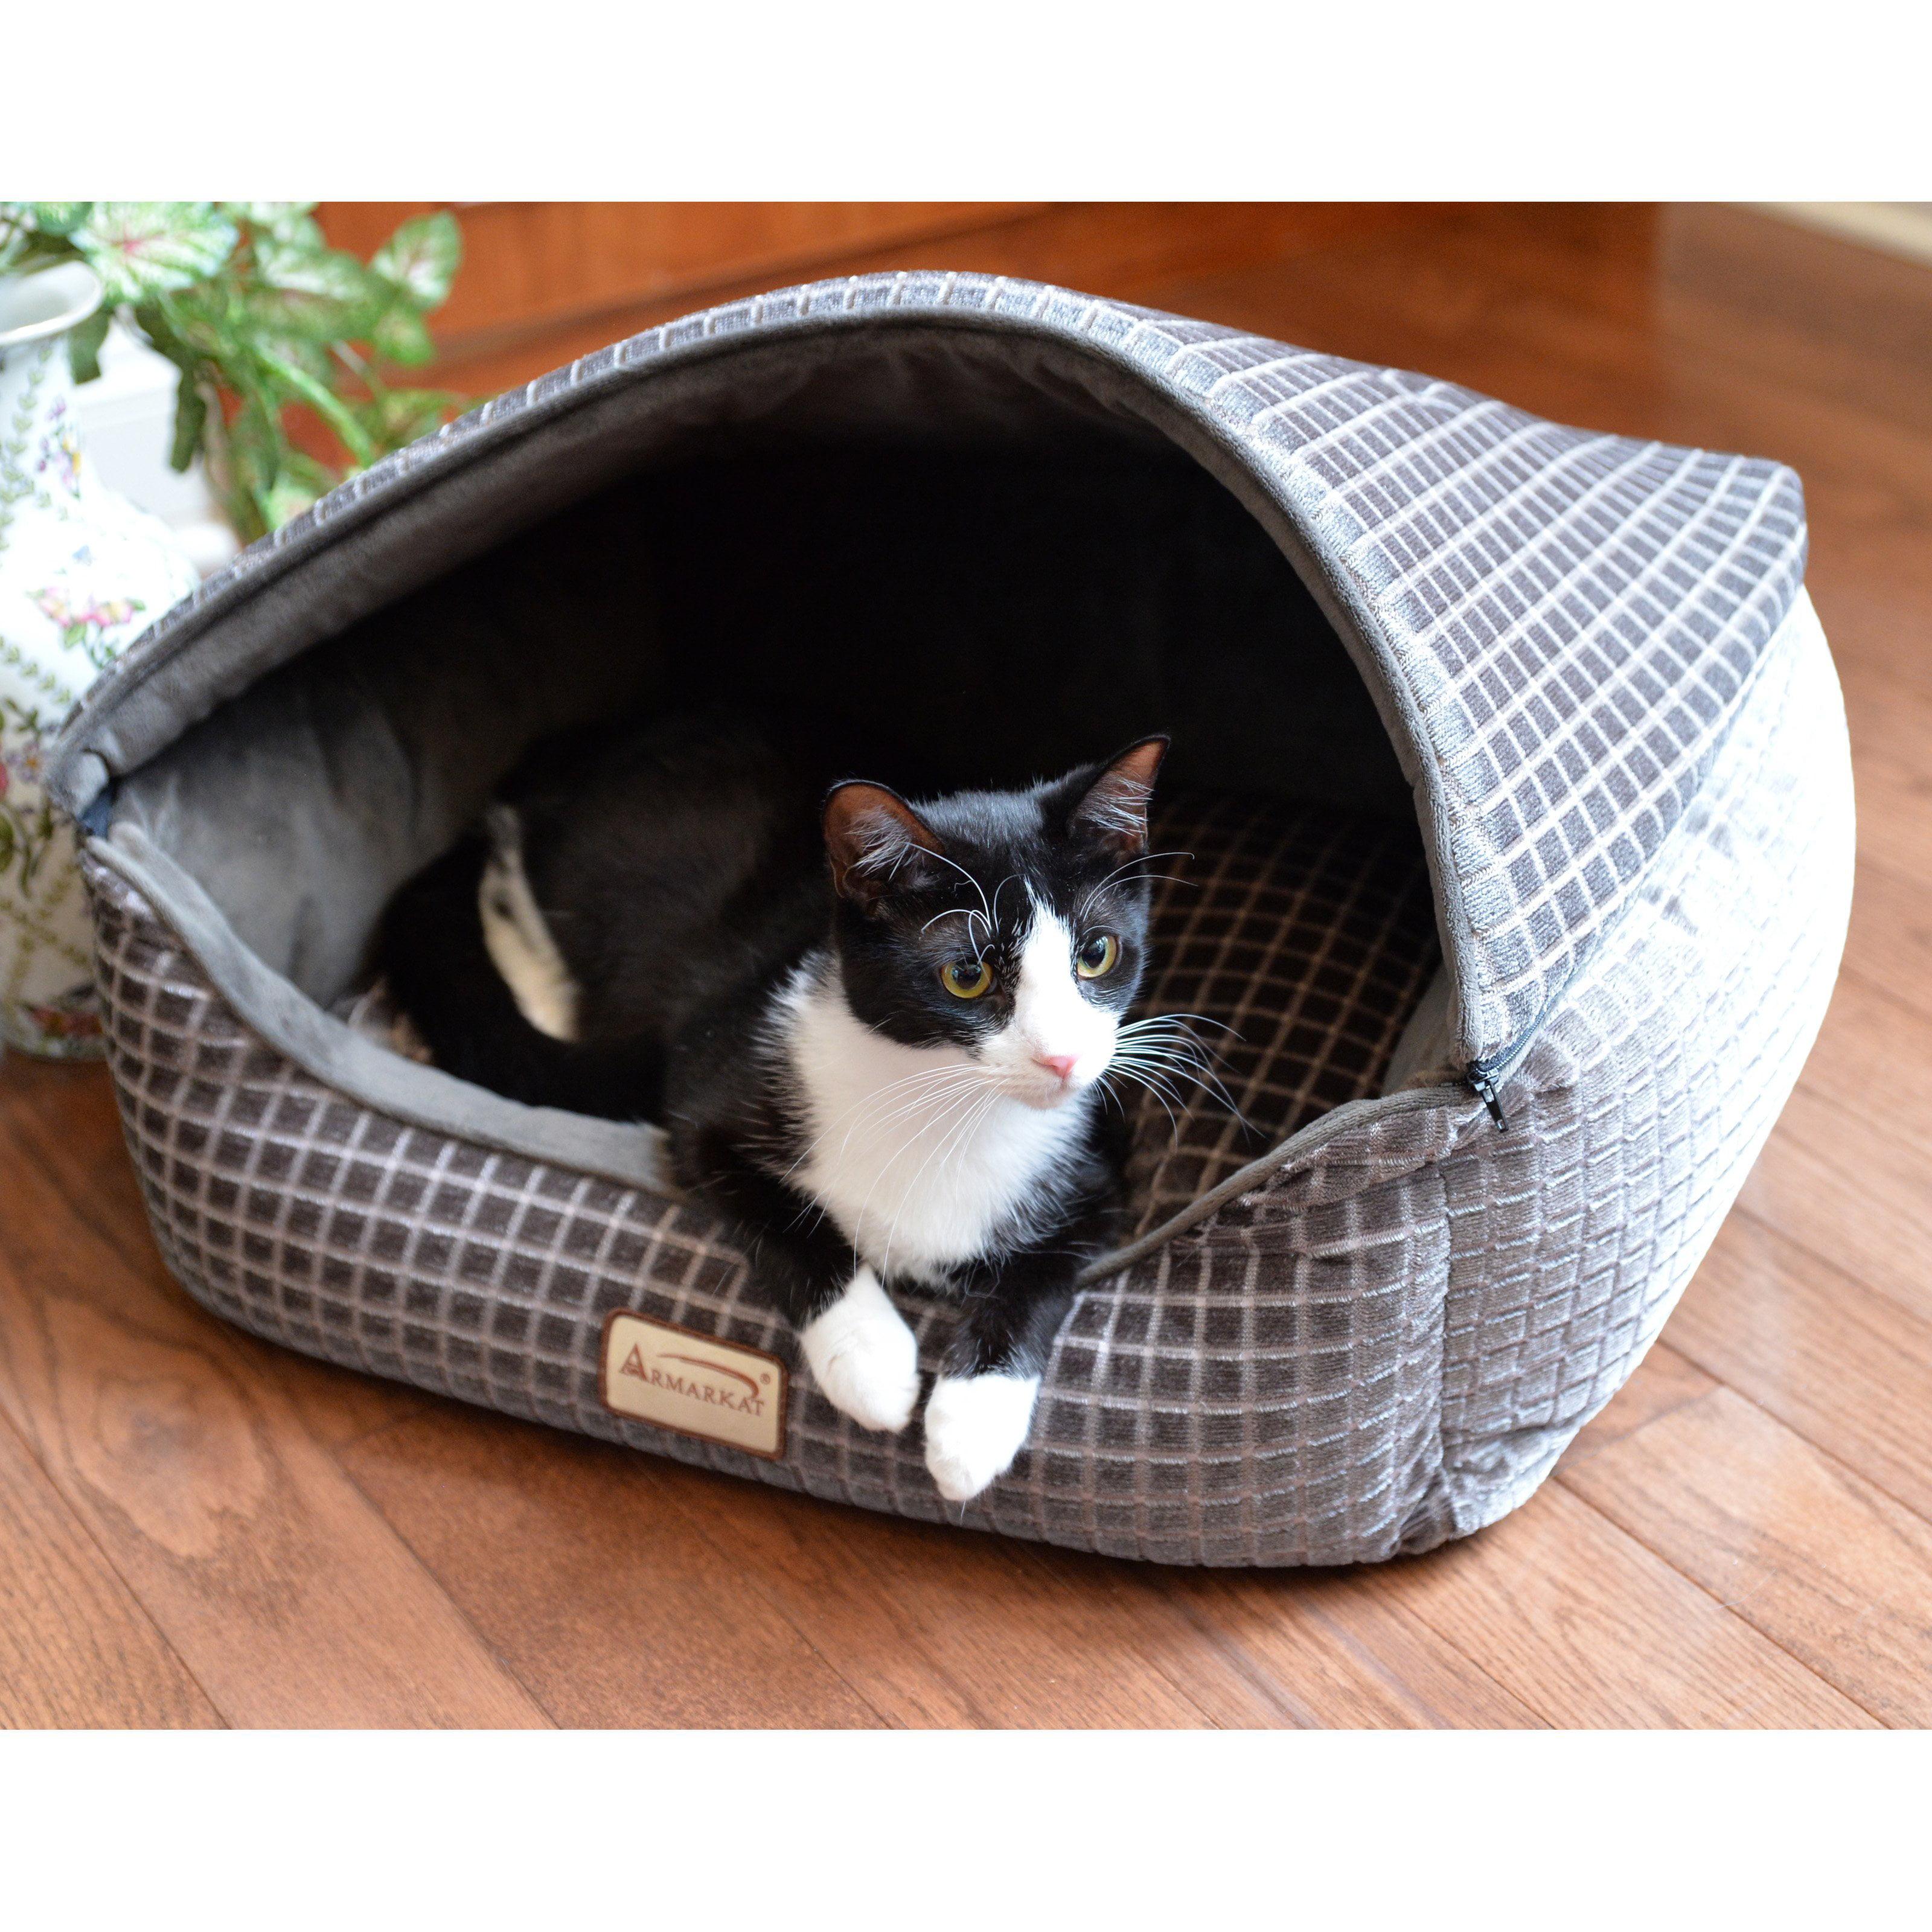 Armarkat Cat Bed C34HHG/SH